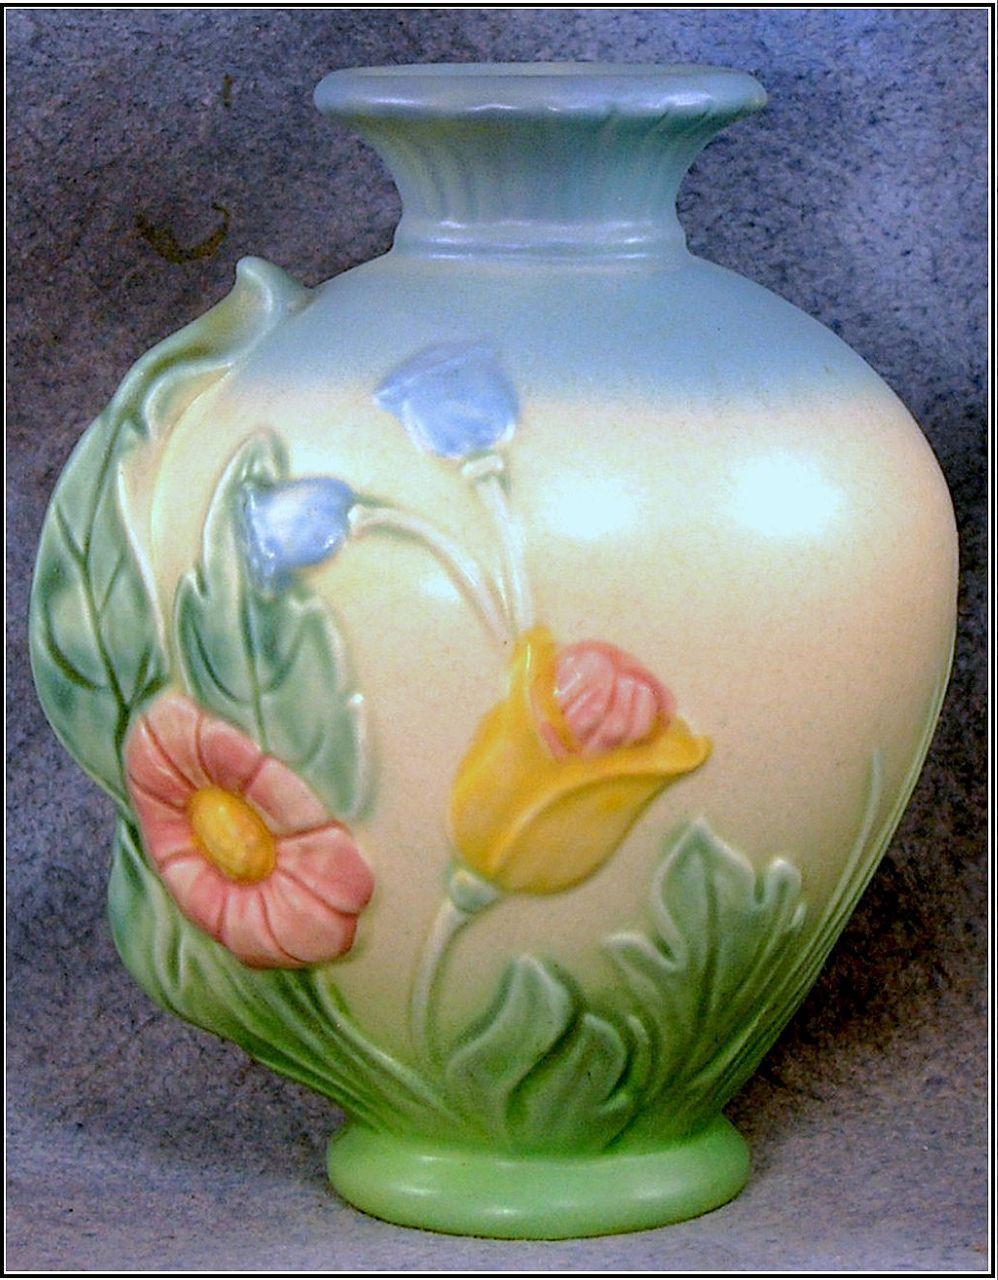 roseville pottery magnolia vase of love the soft colors the cream background vases pinterest in love the soft colors the cream background